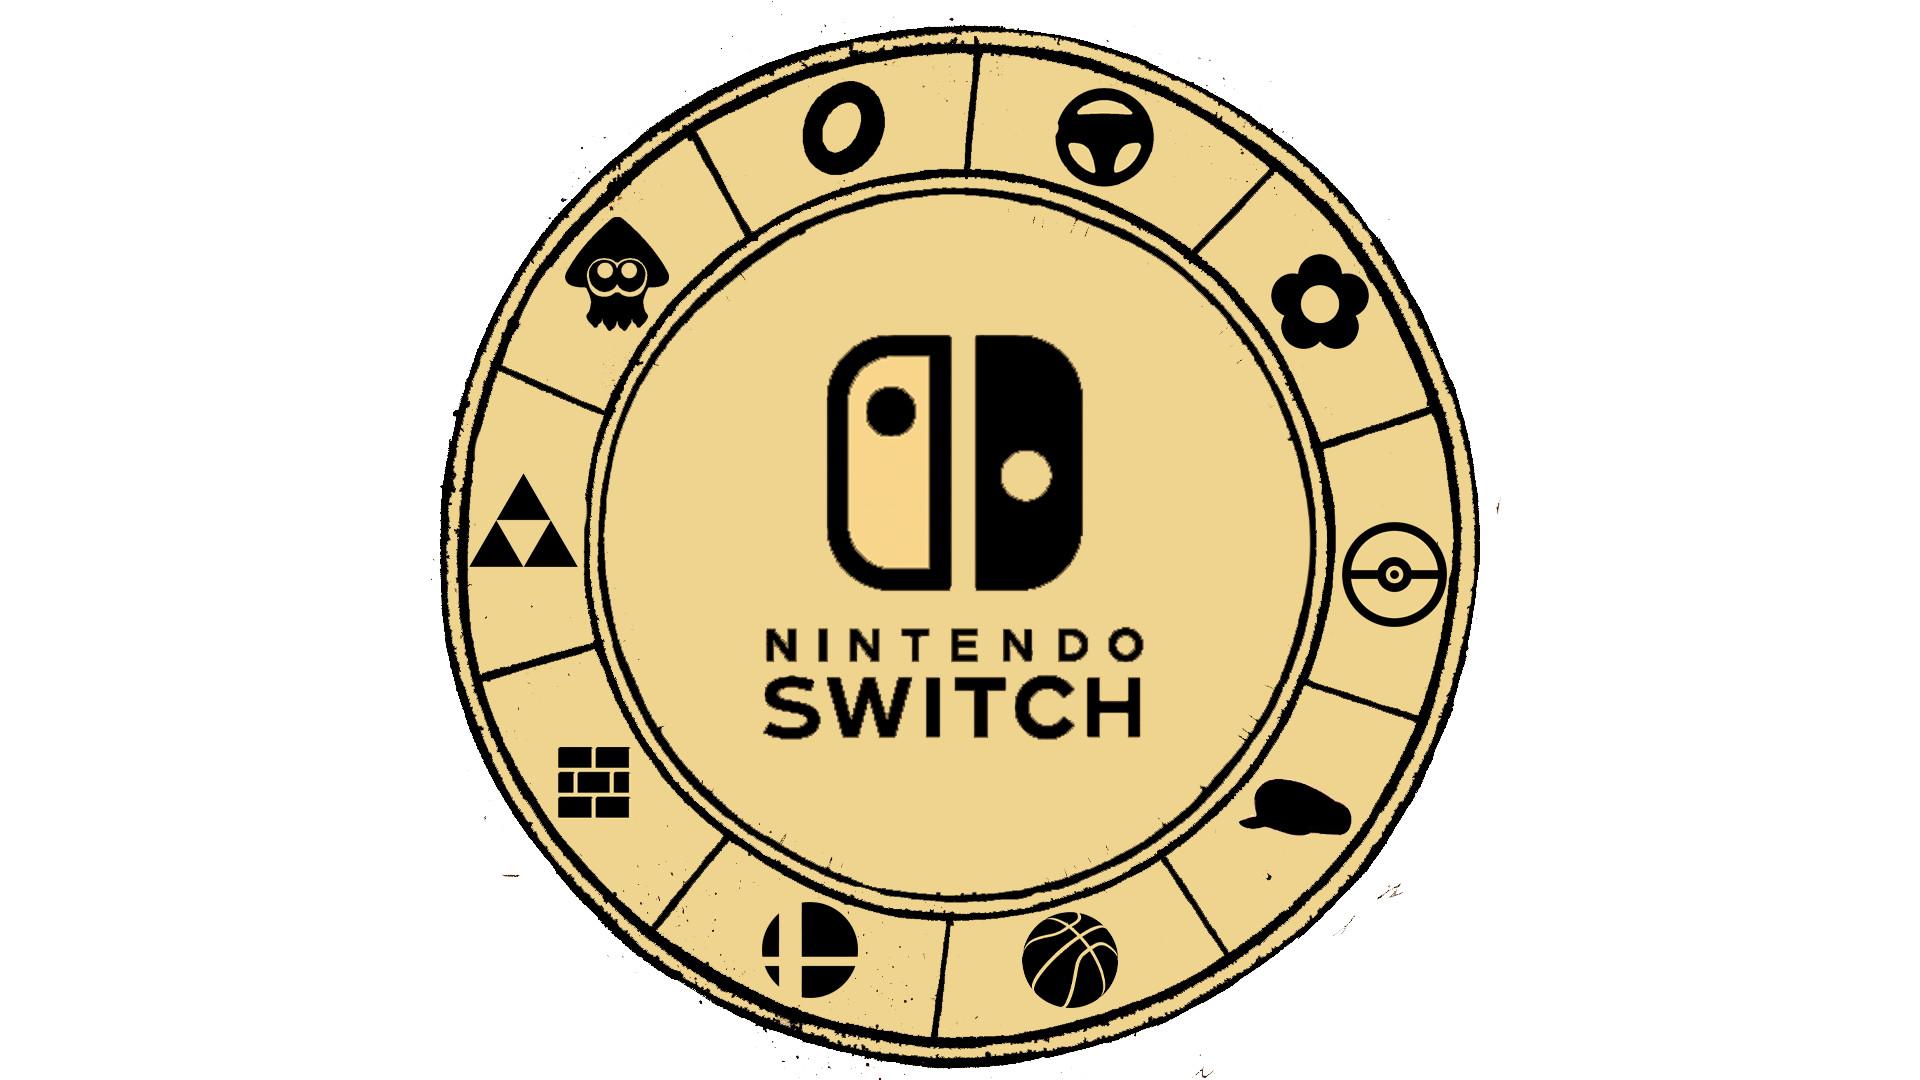 Nintendo Switch Wheel by JIMBOYKELLY Nintendo Switch Wheel by JIMBOYKELLY